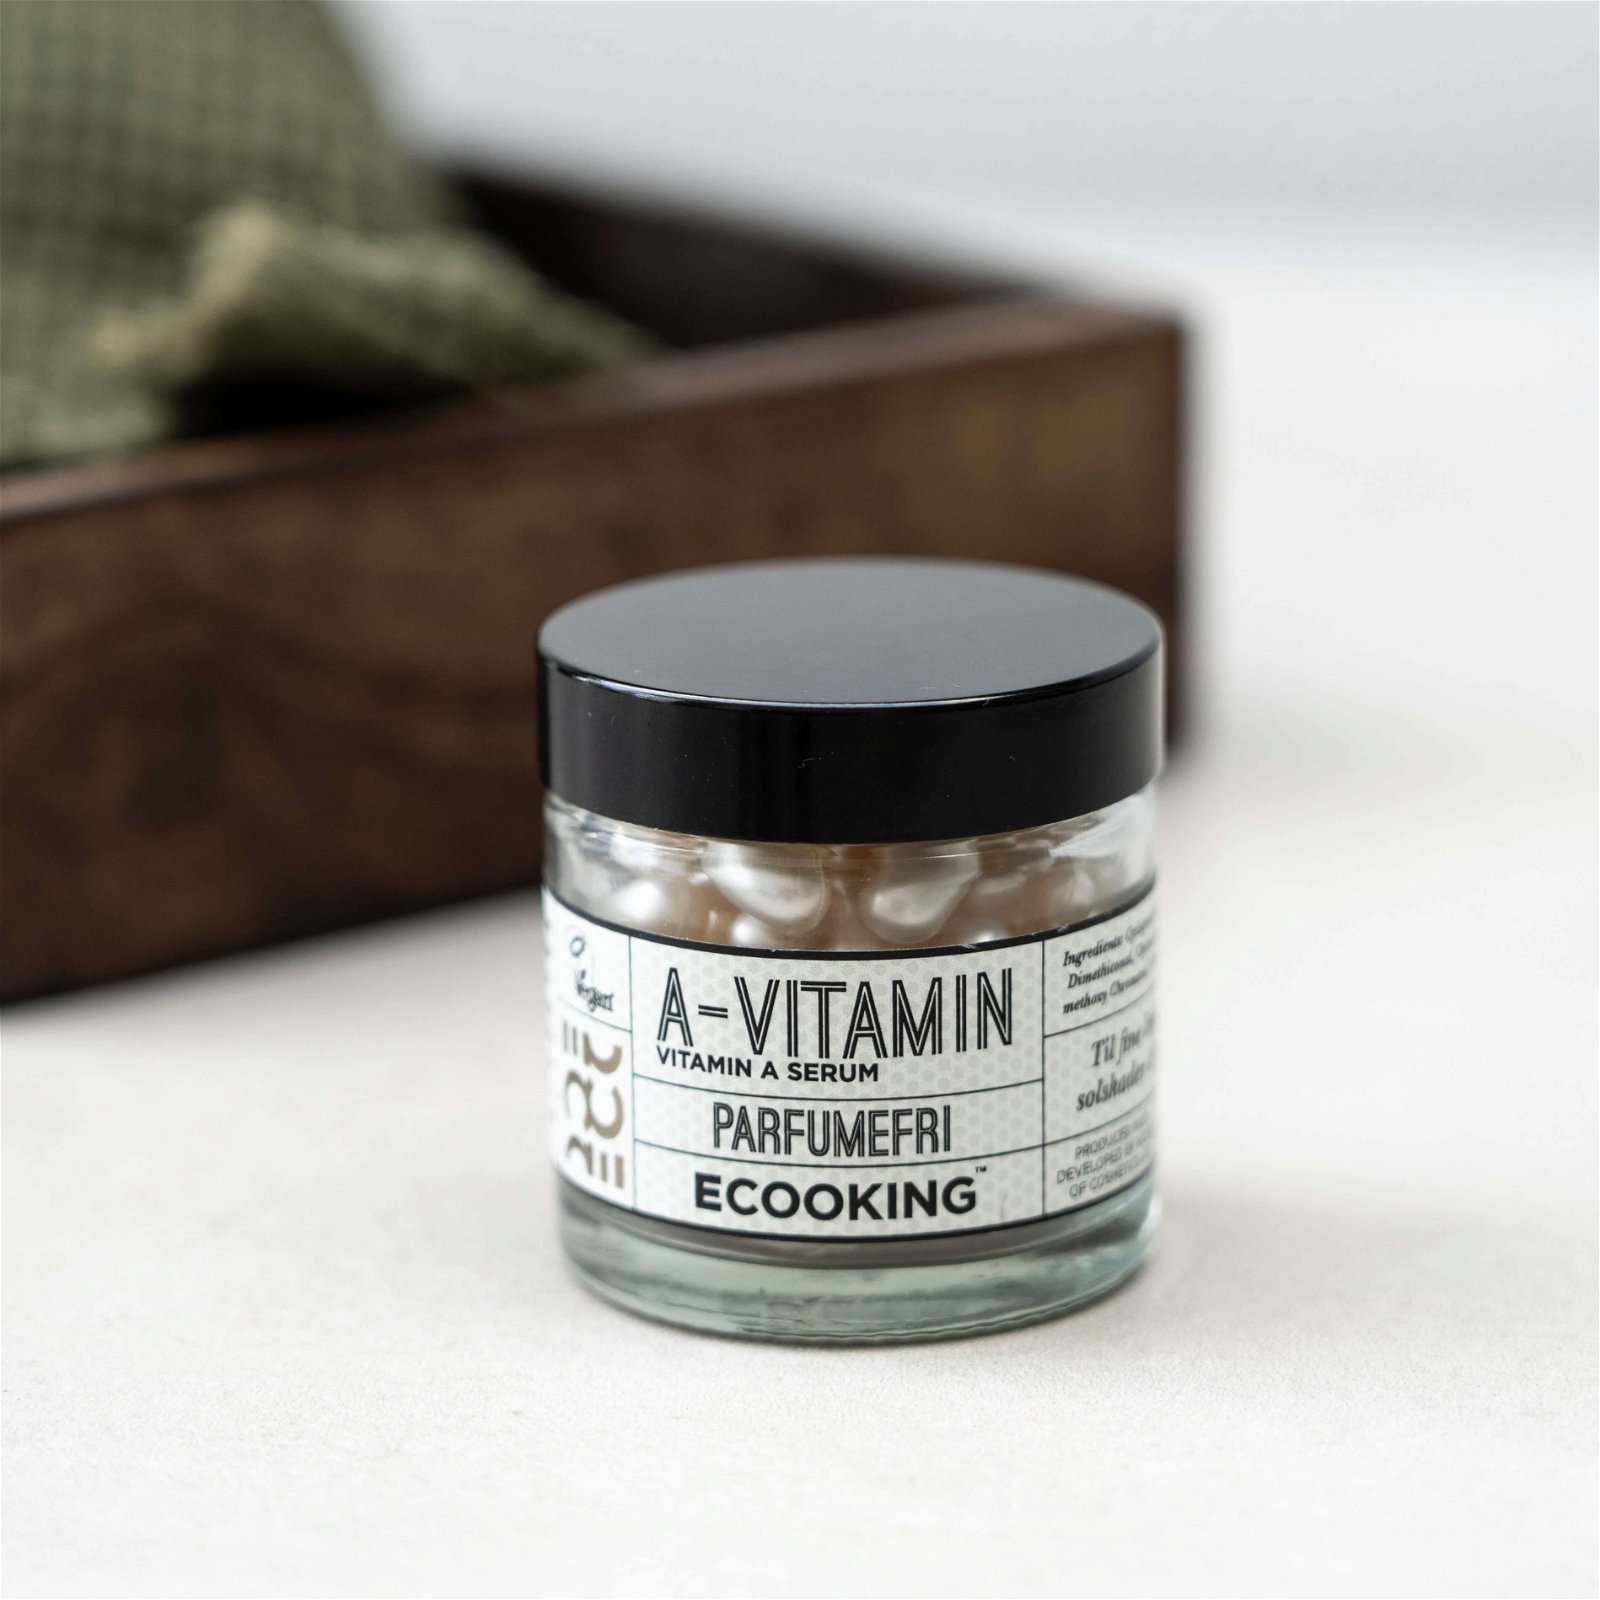 A-vitamin Serum i kapsler 60 stk.